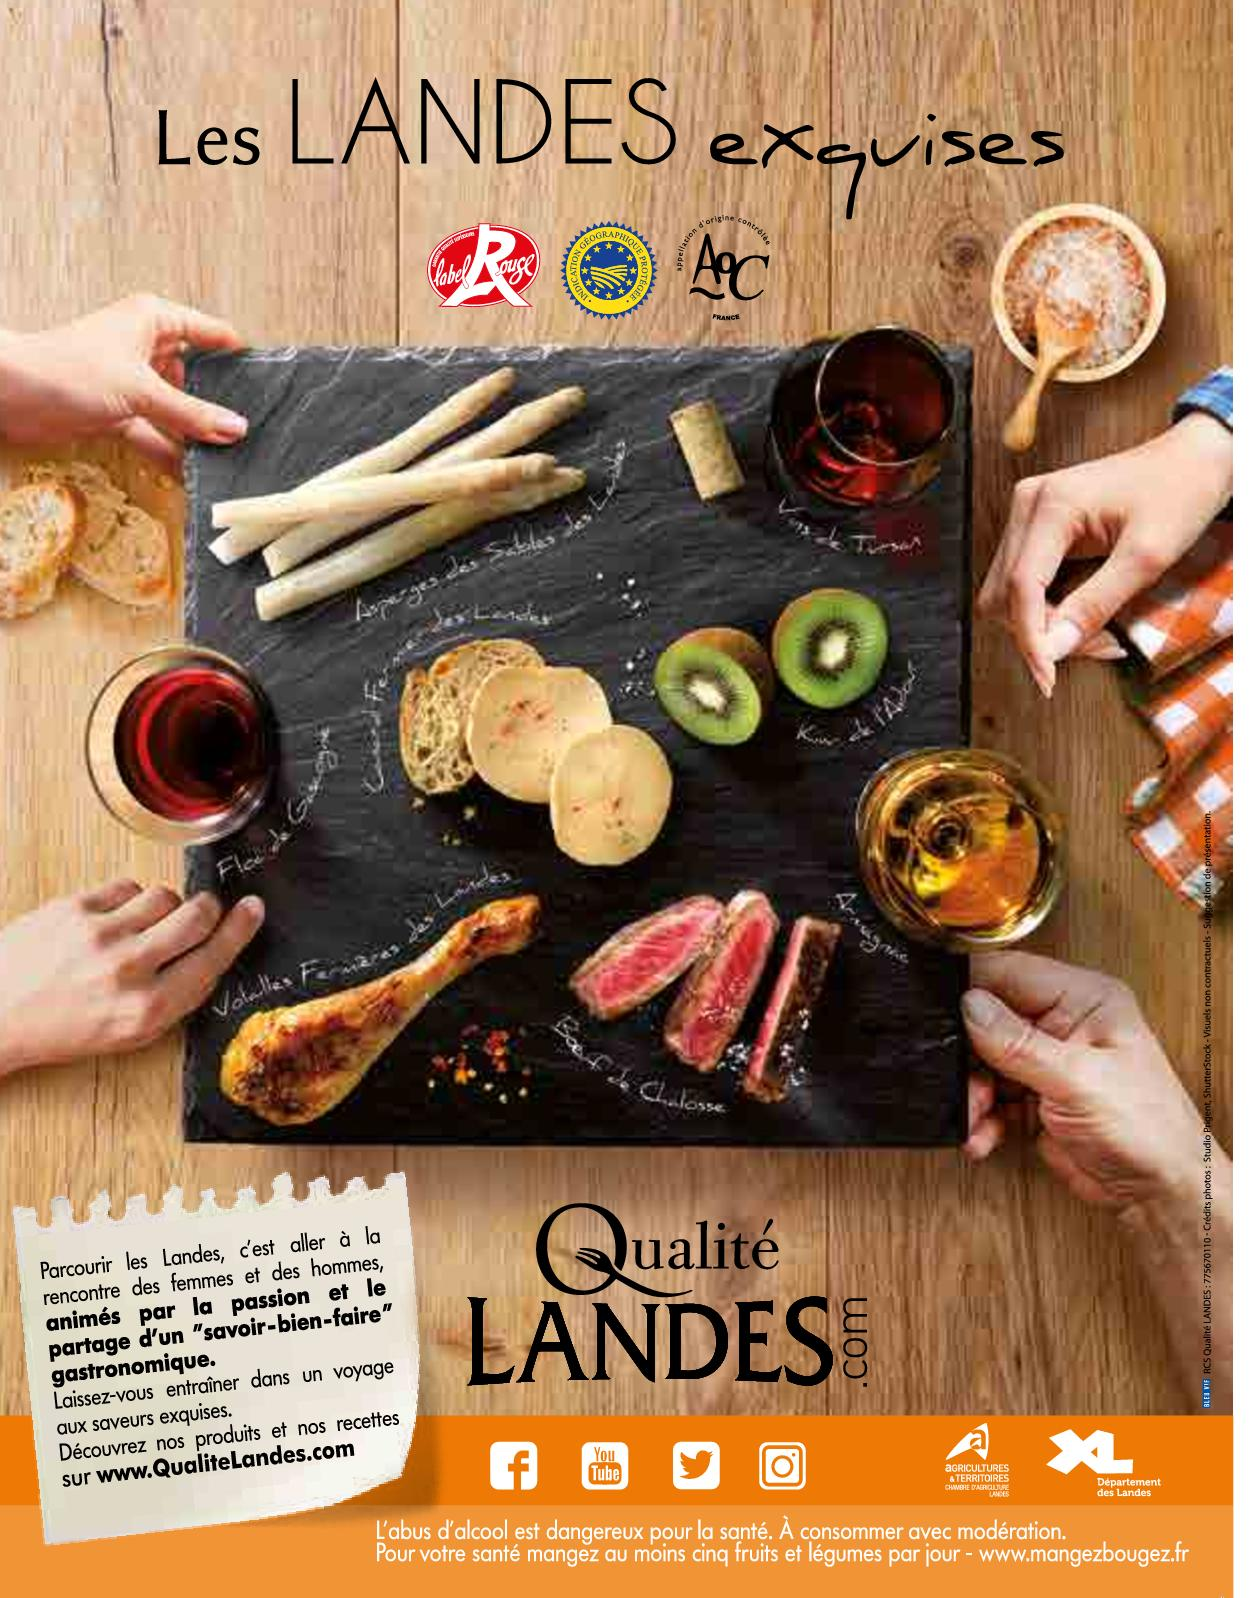 Magazine Landes 2018 Calameo Downloader